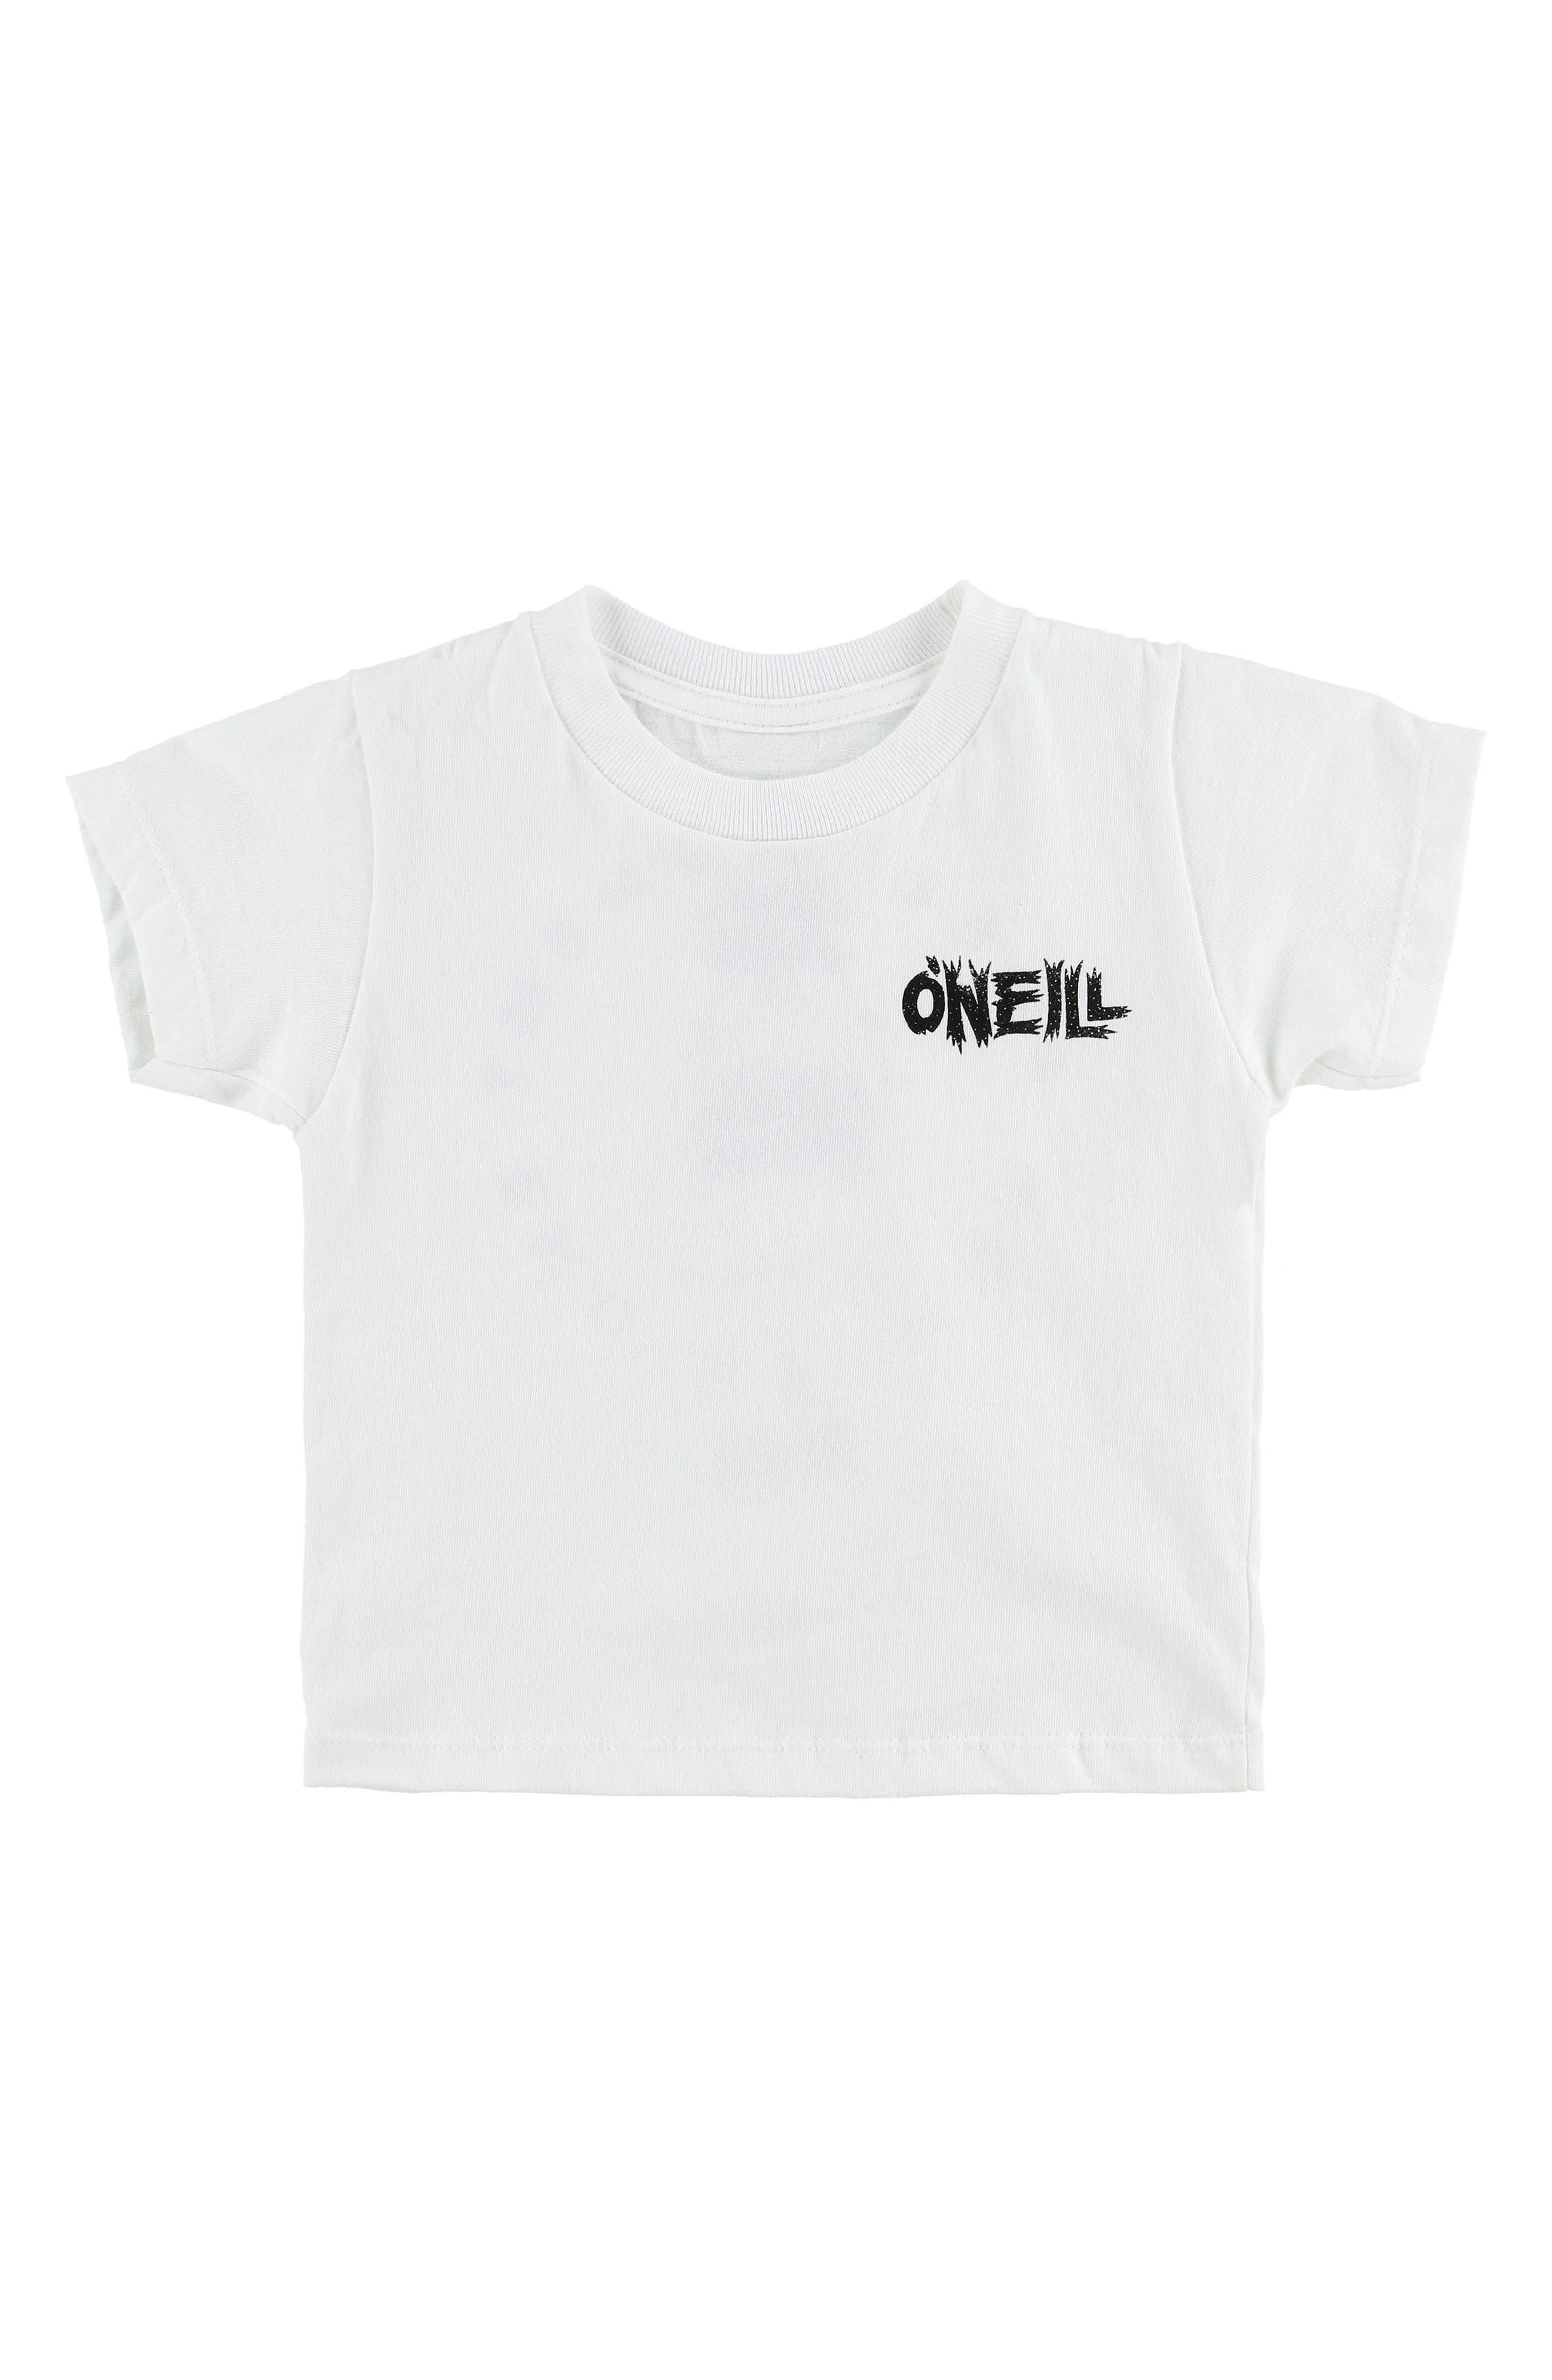 Enemy Graphic T-Shirt,                             Main thumbnail 1, color,